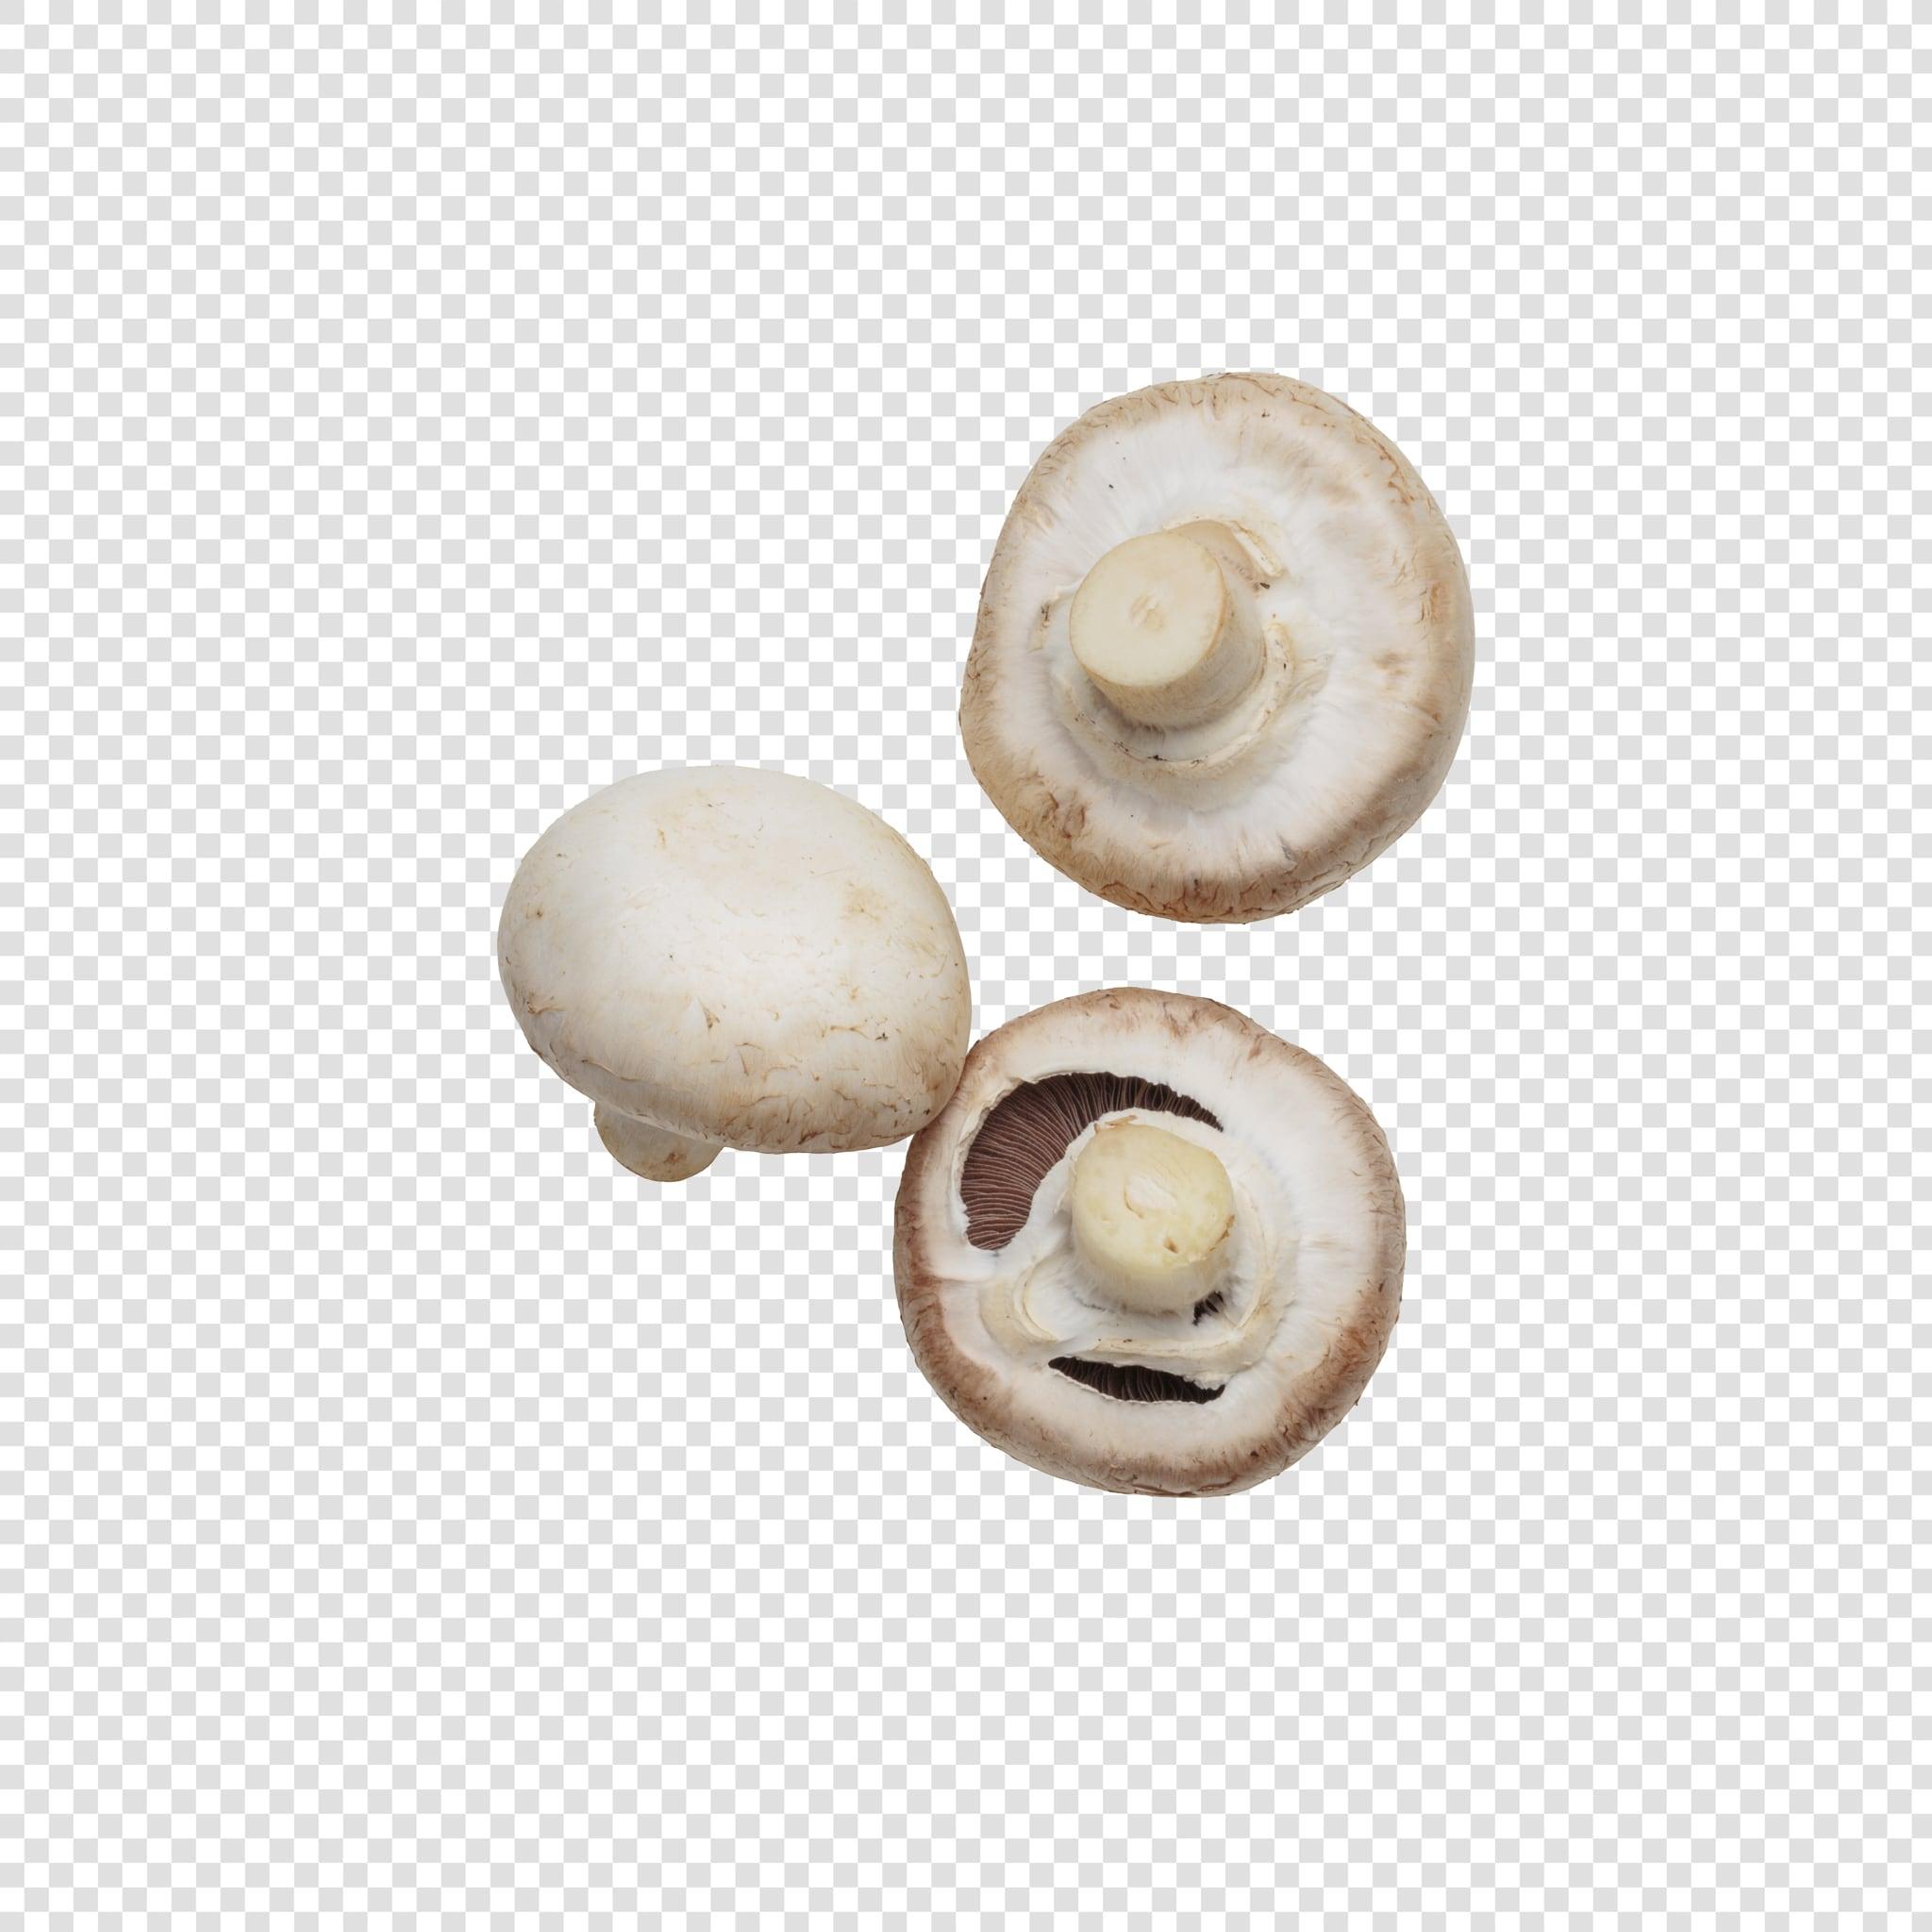 Champignon PSD layered image